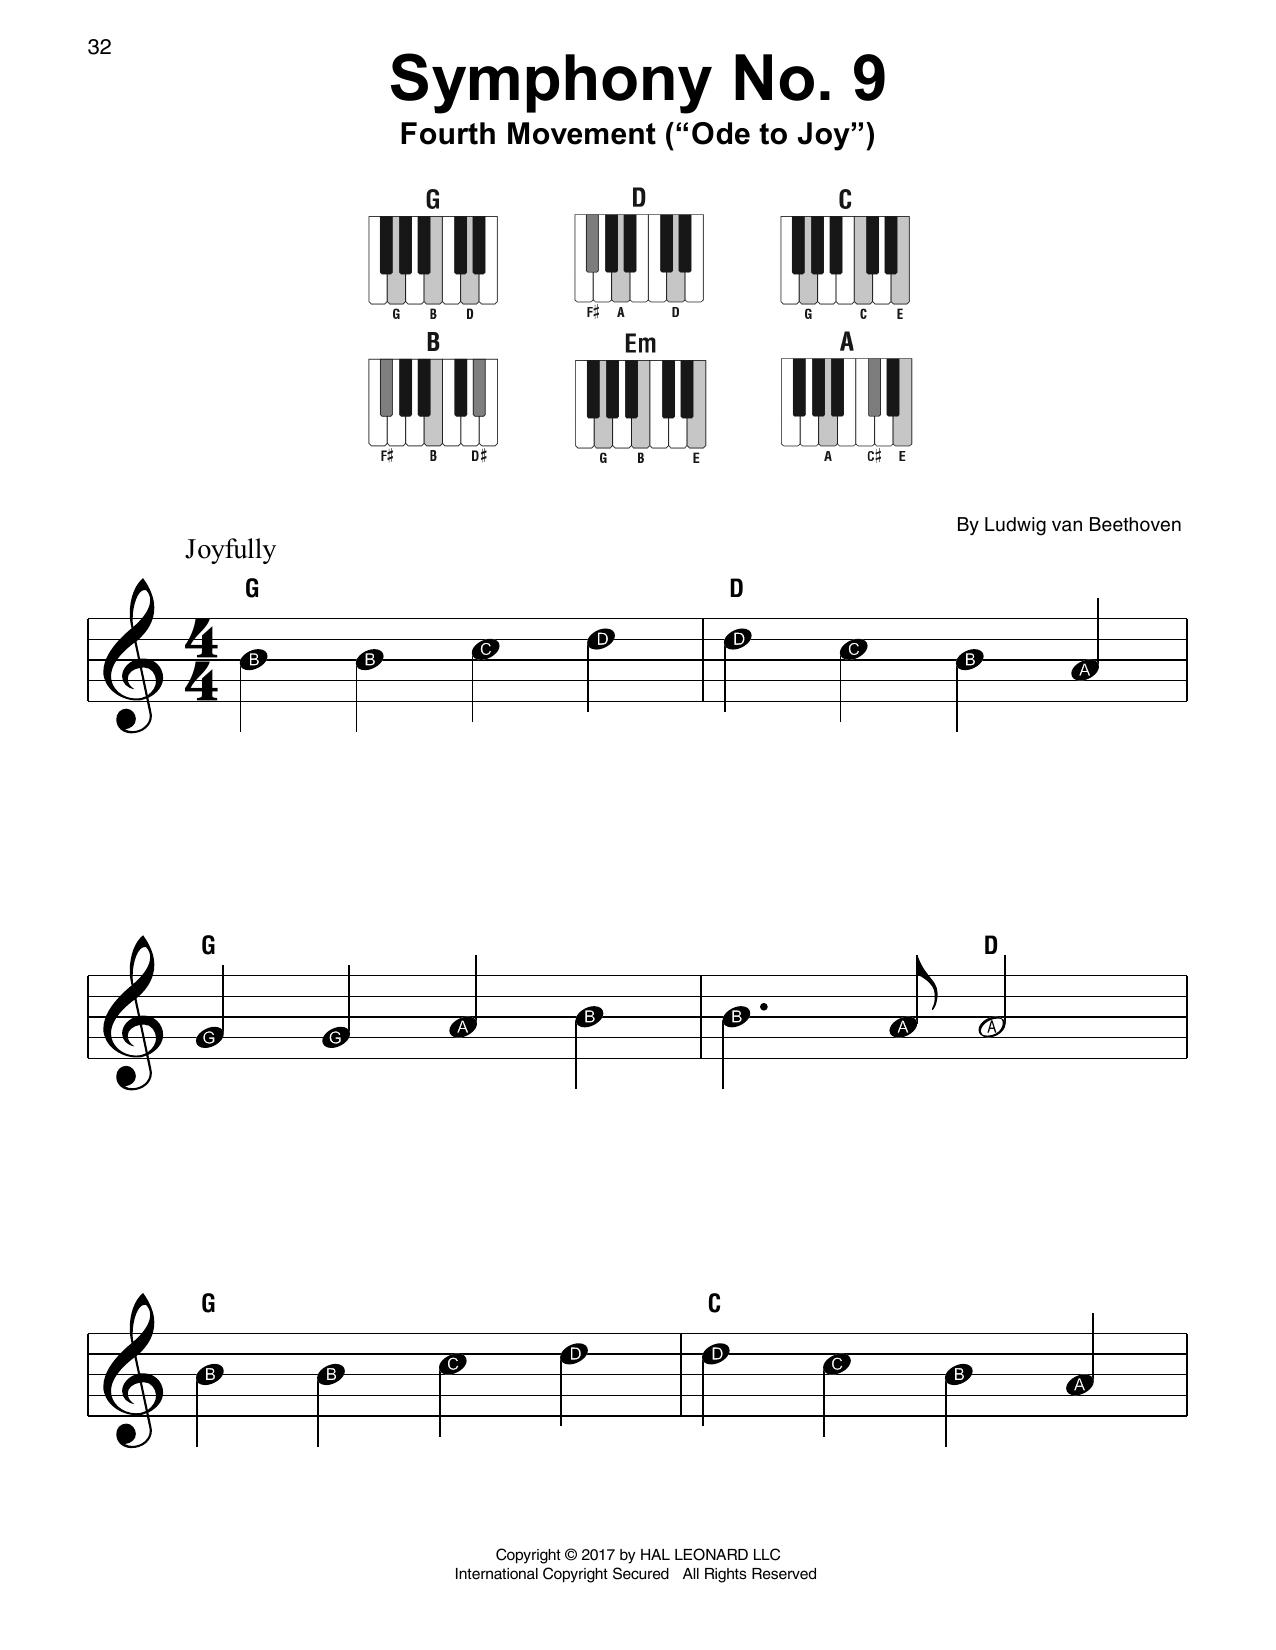 Symphony No. 9, Fourth Movement (Super Easy Piano)